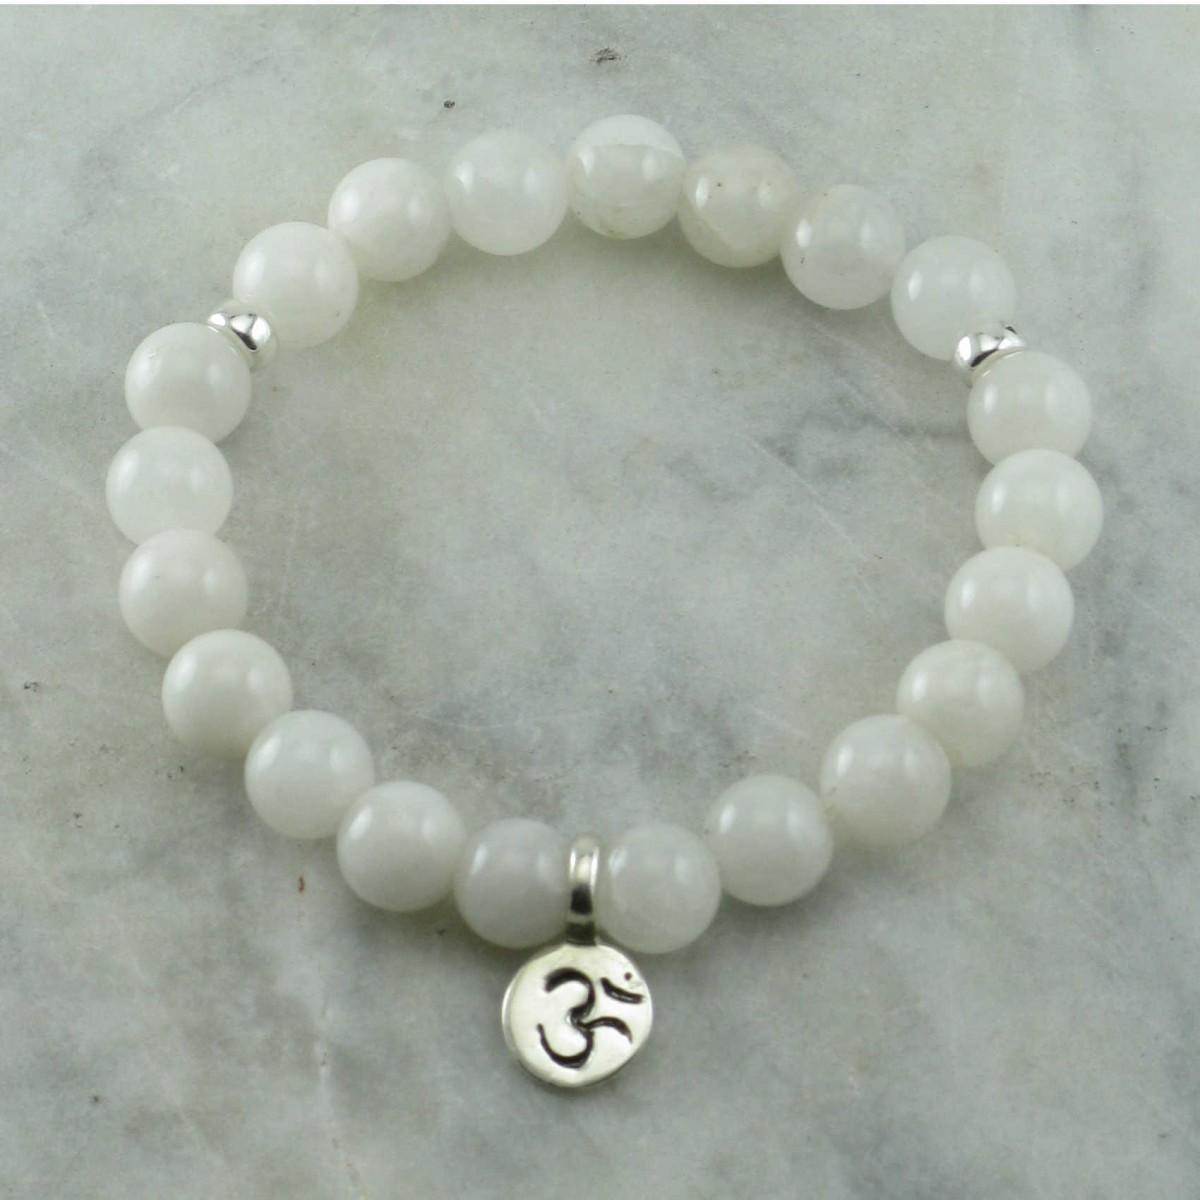 Spirituality_Crown_Chakra_Mala_Bracelet_21_White_Tourmaline_Quartz_Mala_Beads